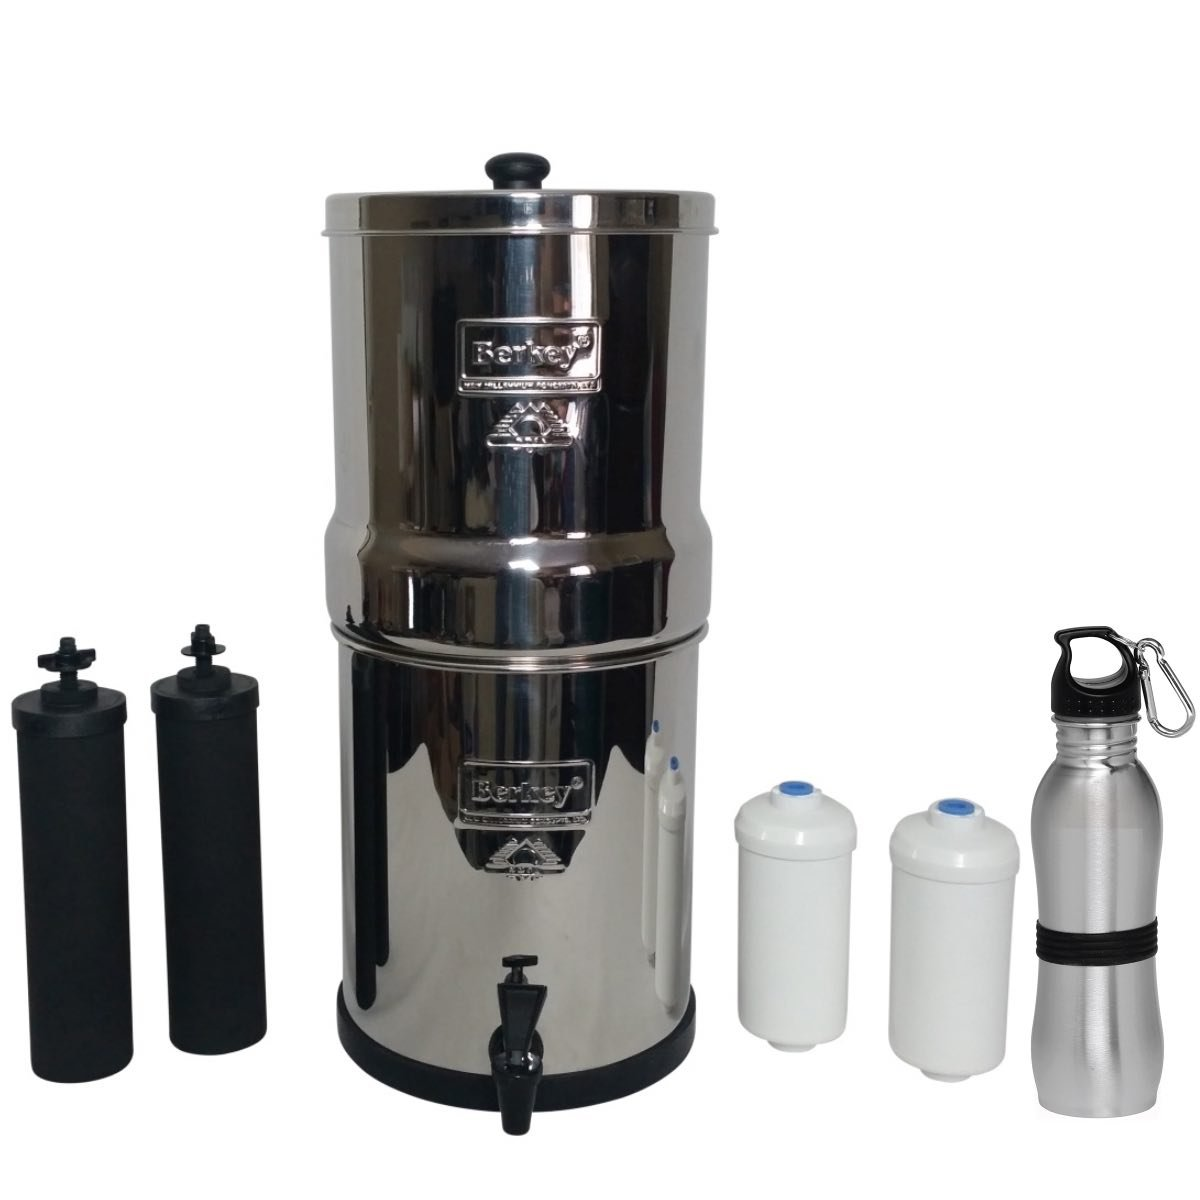 Big Berkey Water Filter 2 Gallon System Bundle: 2 Black BB9 Filters, 2 Fluoride PF2 Filters, 1 Stainless Steel Water Bottle